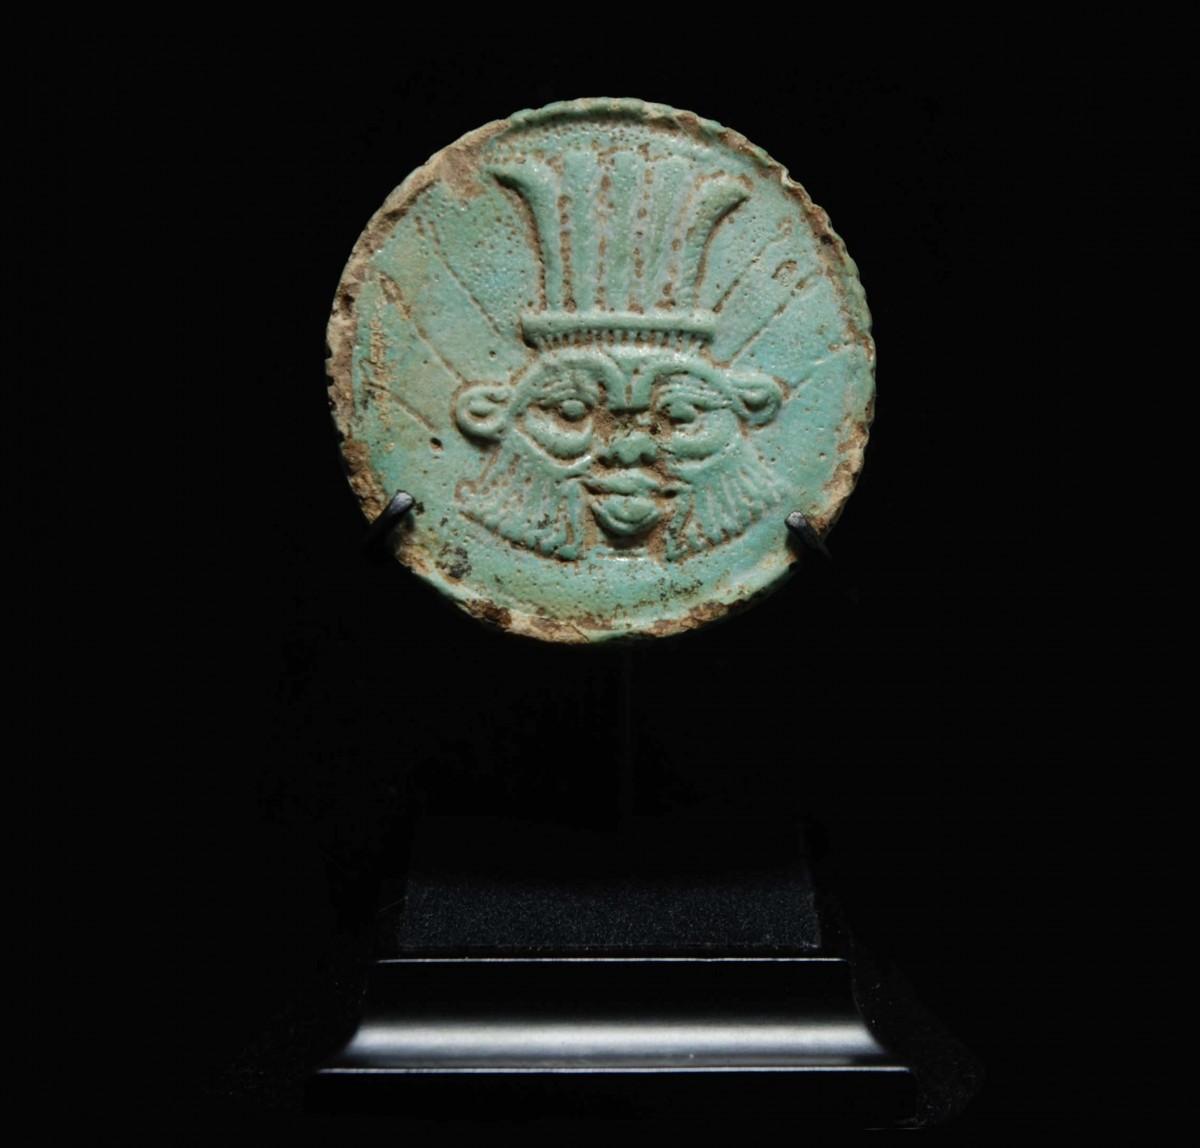 Fayence amulet with Bes and Horus Eye mounted